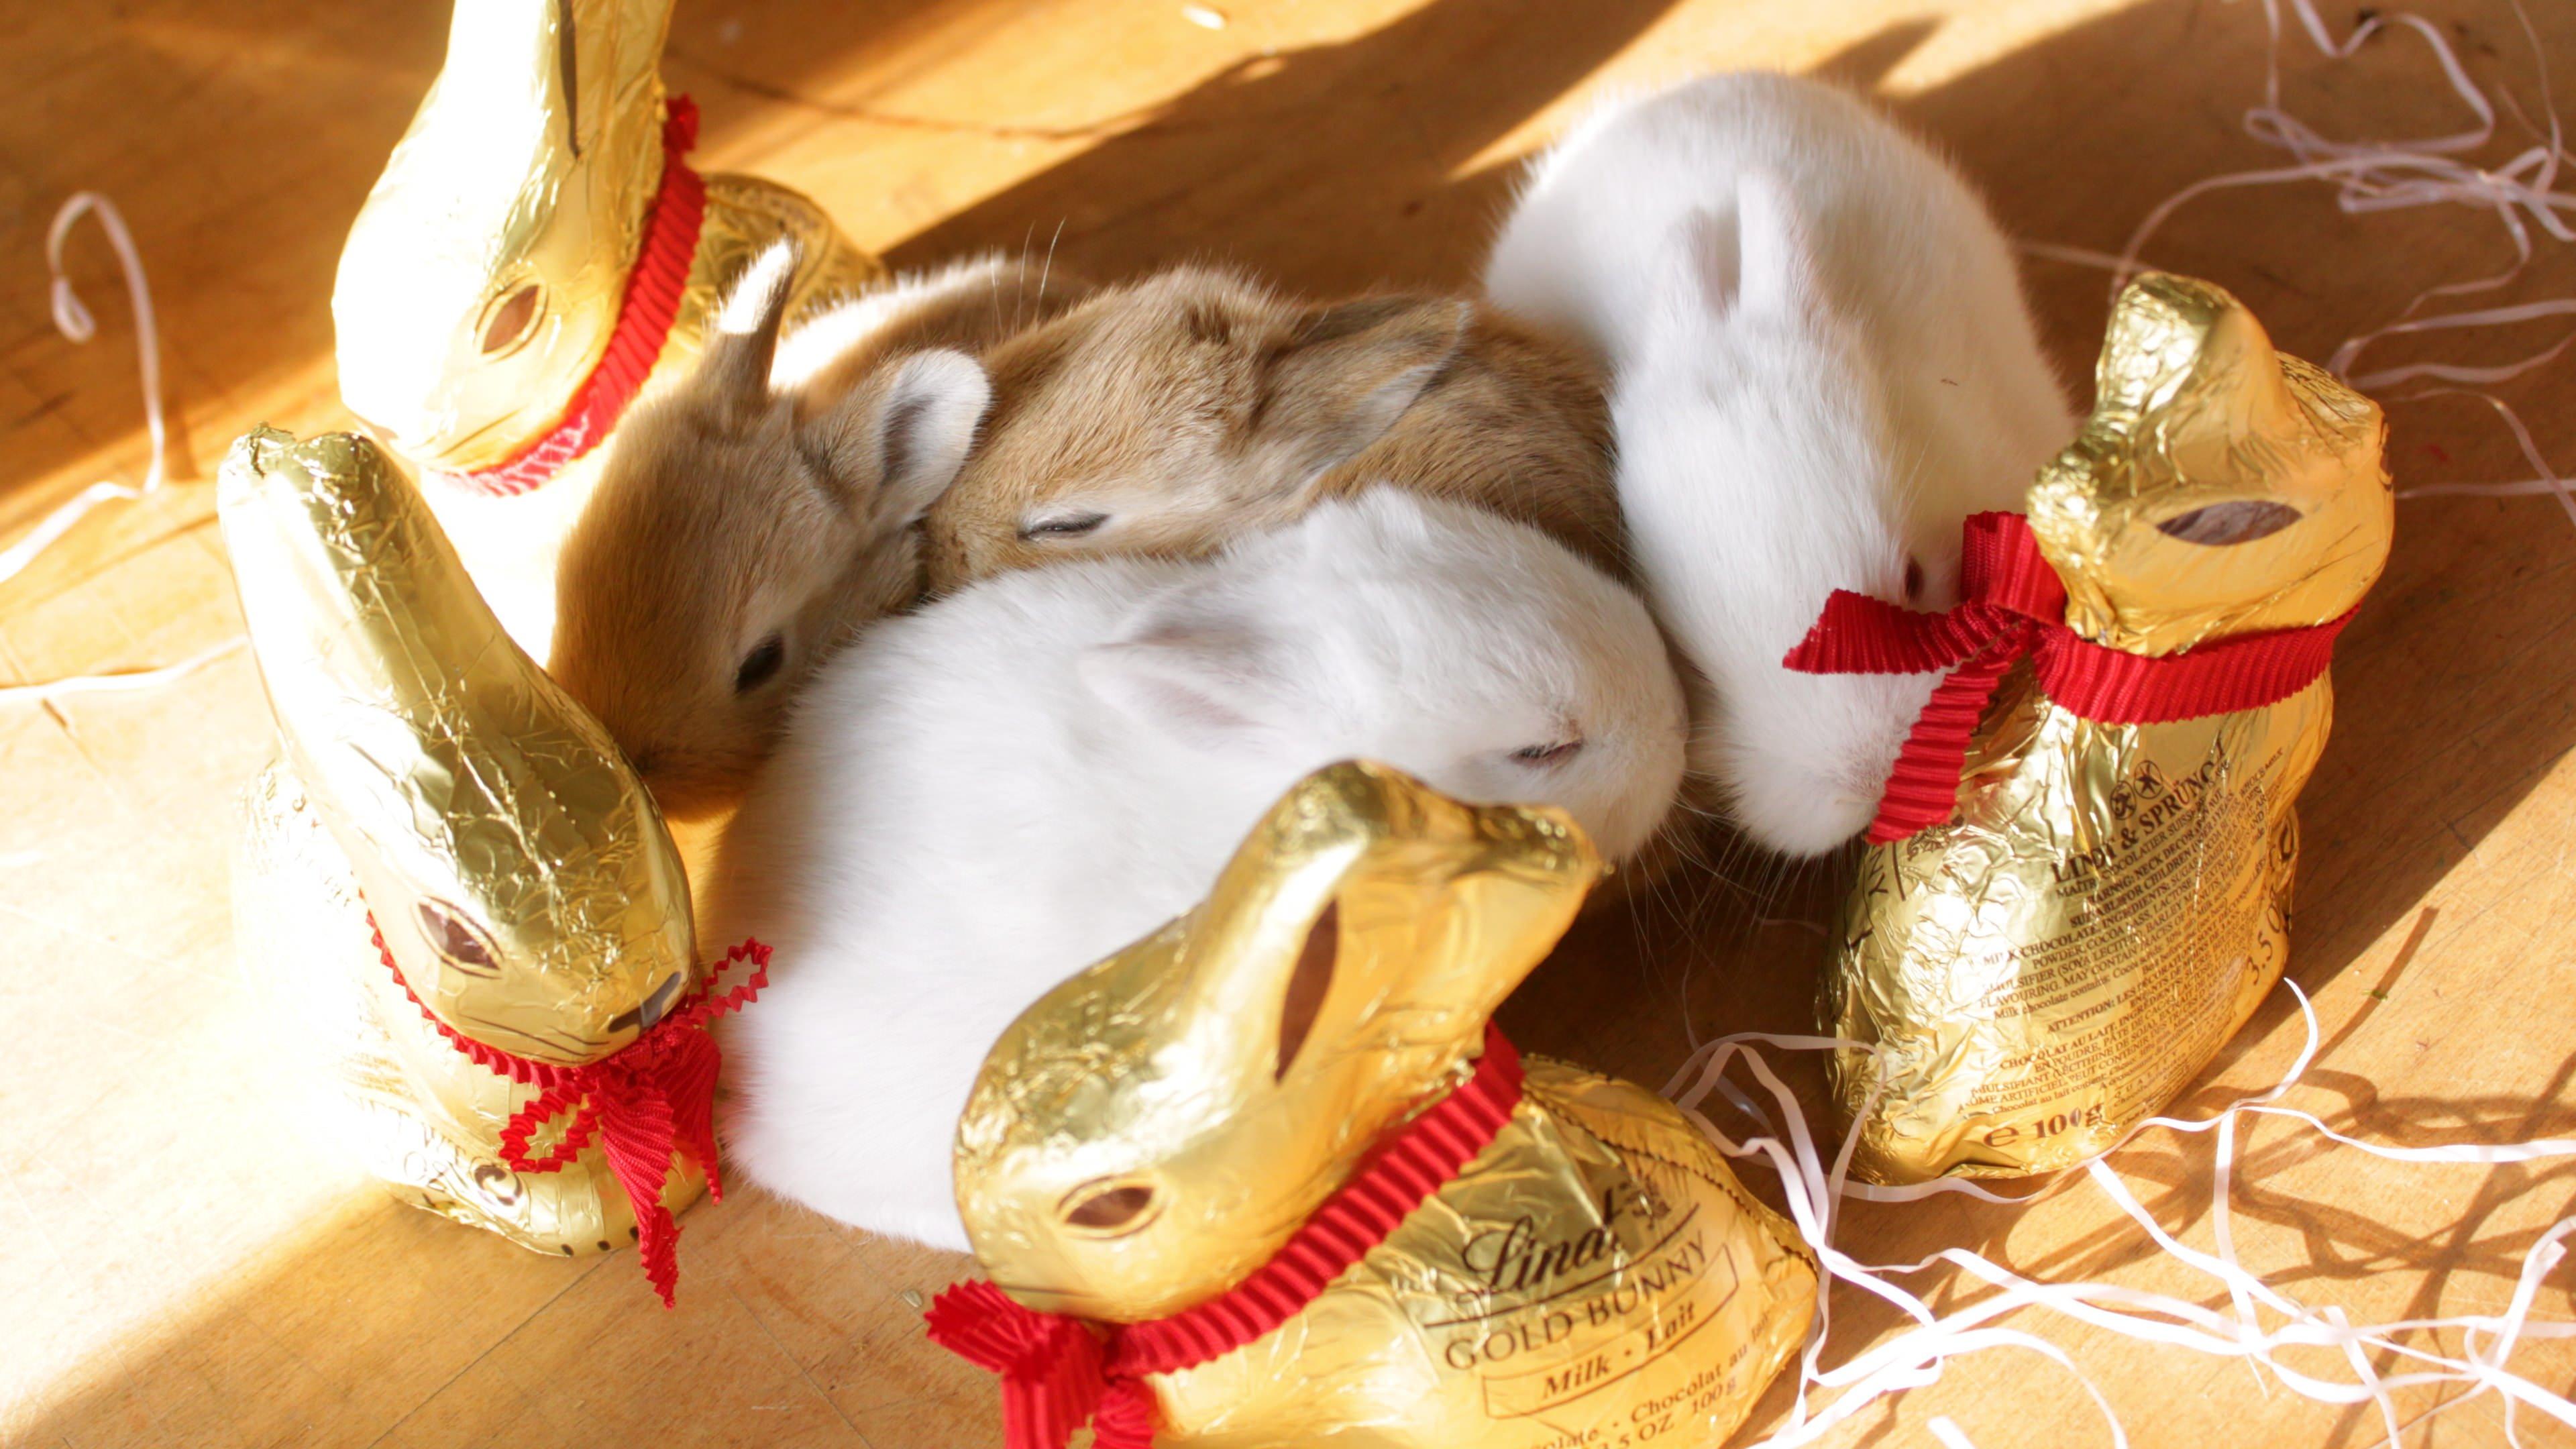 bunny 2016 easter 4k - photo #7